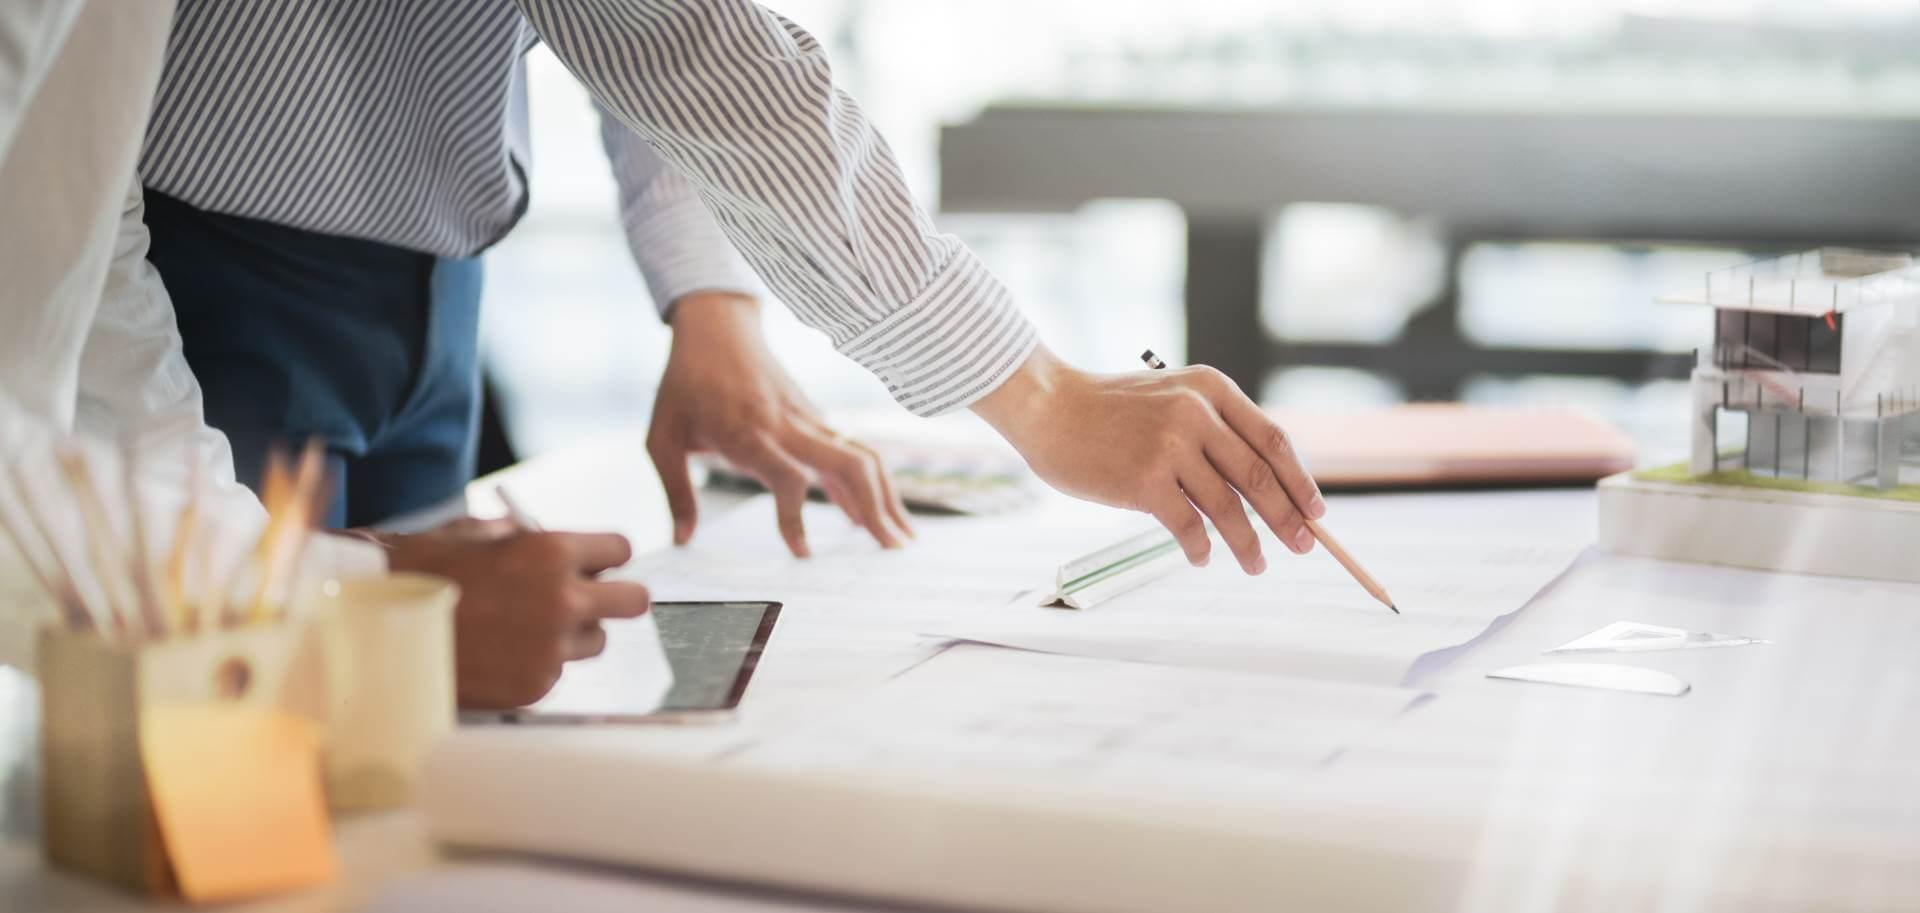 структура комплексного бизнес плана